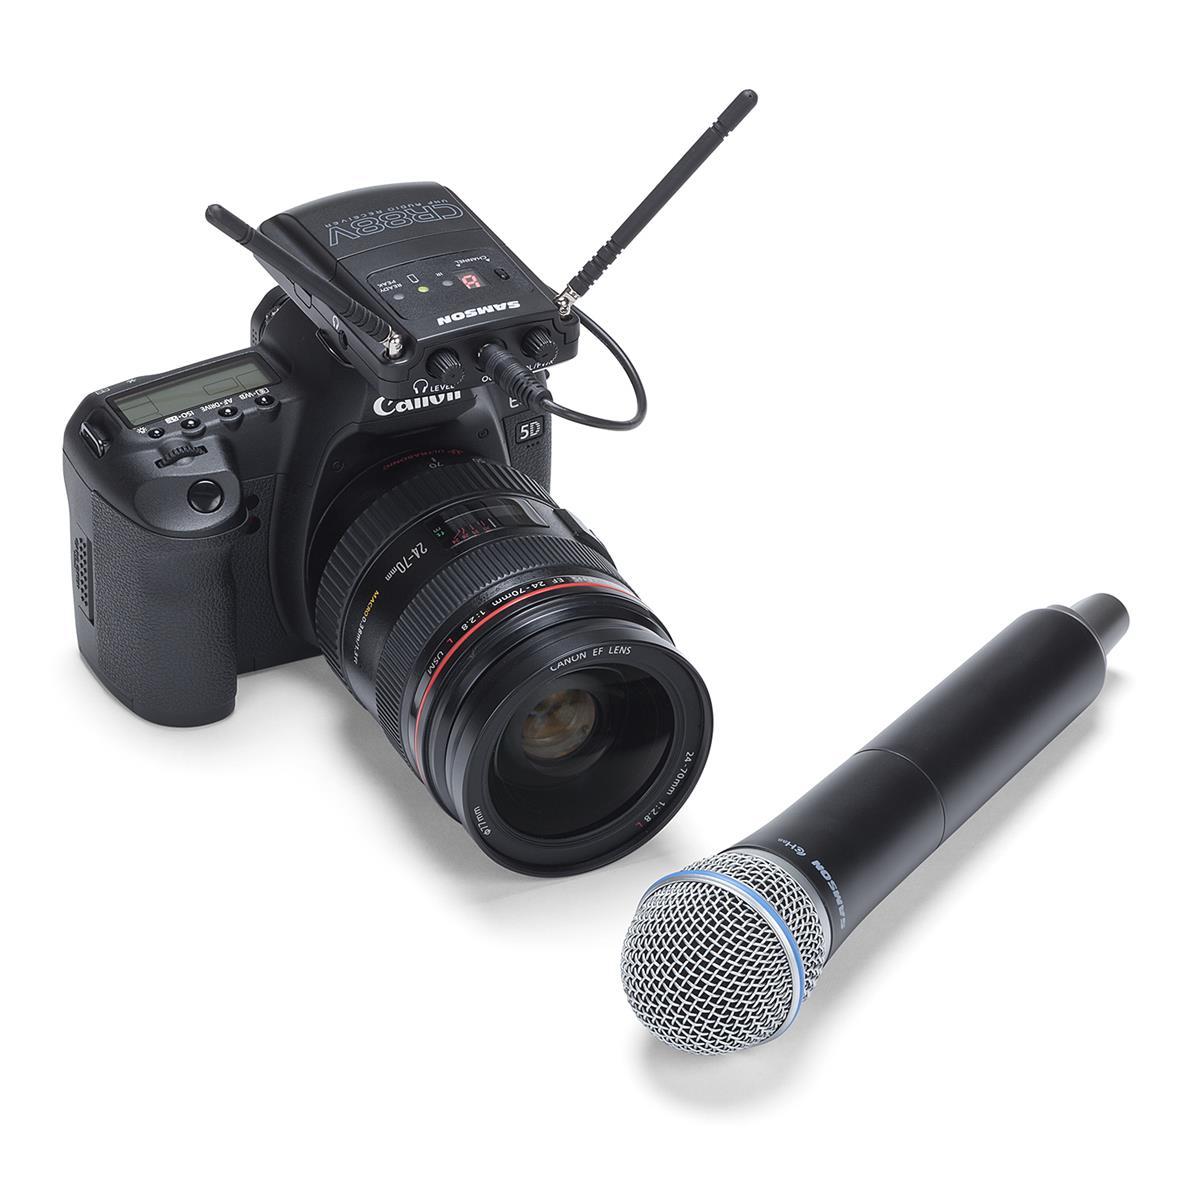 Samson-CONCERT-88-UHF-Camera-Handheld-System-F-606-630-MHz-sku-7649290644070